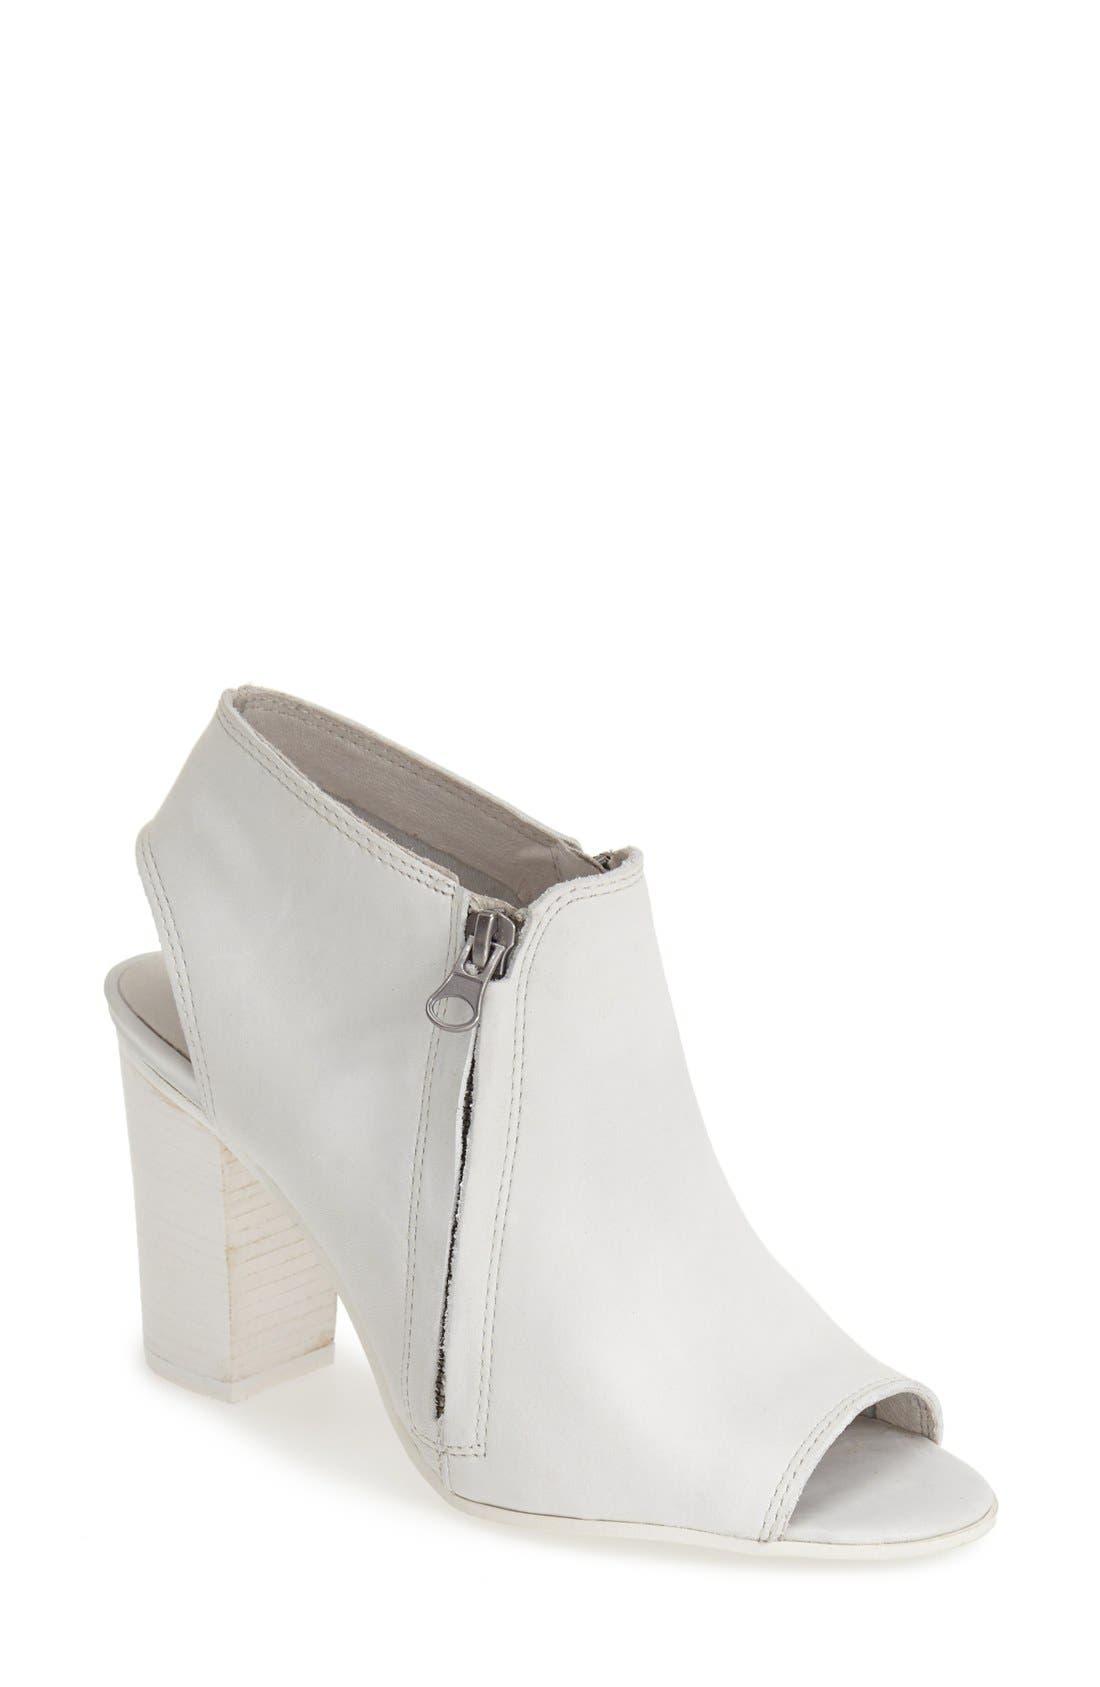 Main Image - Matisse 'Dolan' Open Toe Boot (Women)